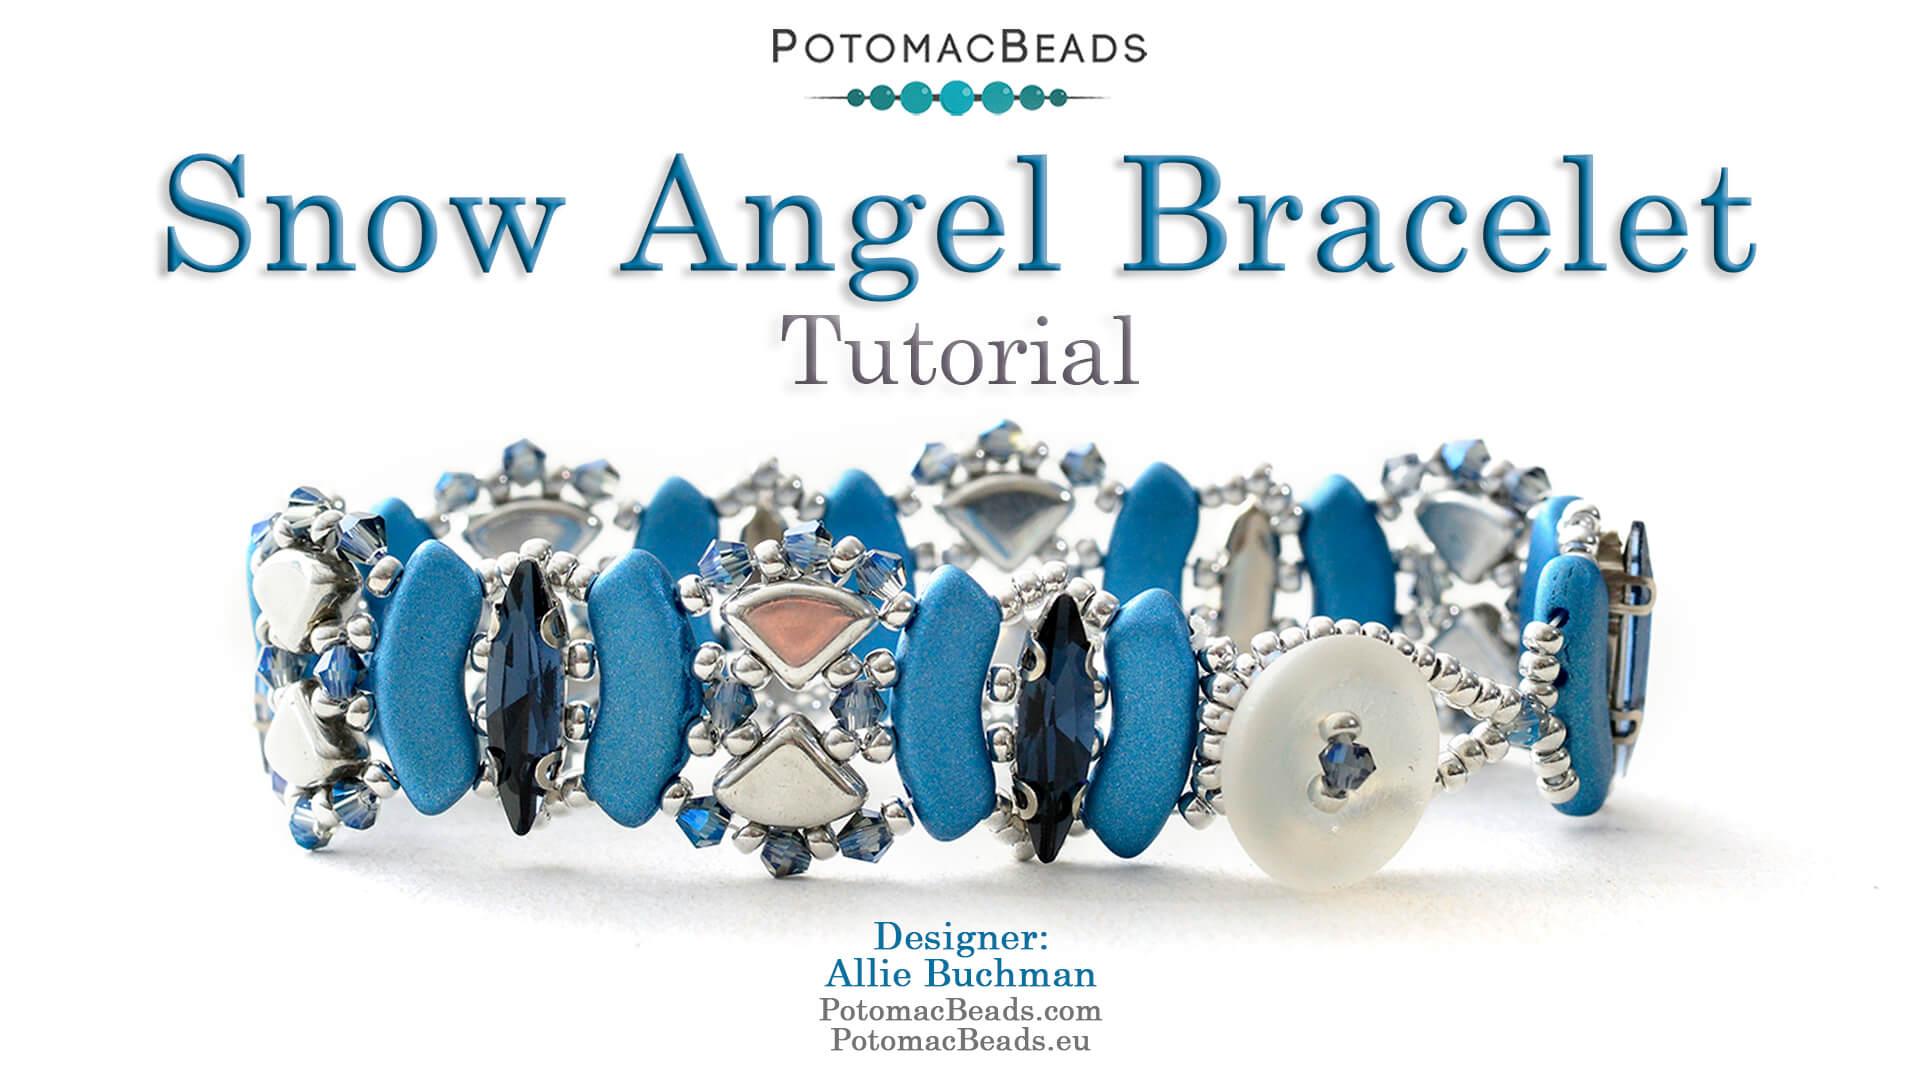 How to Bead Jewelry / Videos Sorted by Beads / QuadBow & PieDuo Bead Videos / Snow Angel Bracelet Tutorial